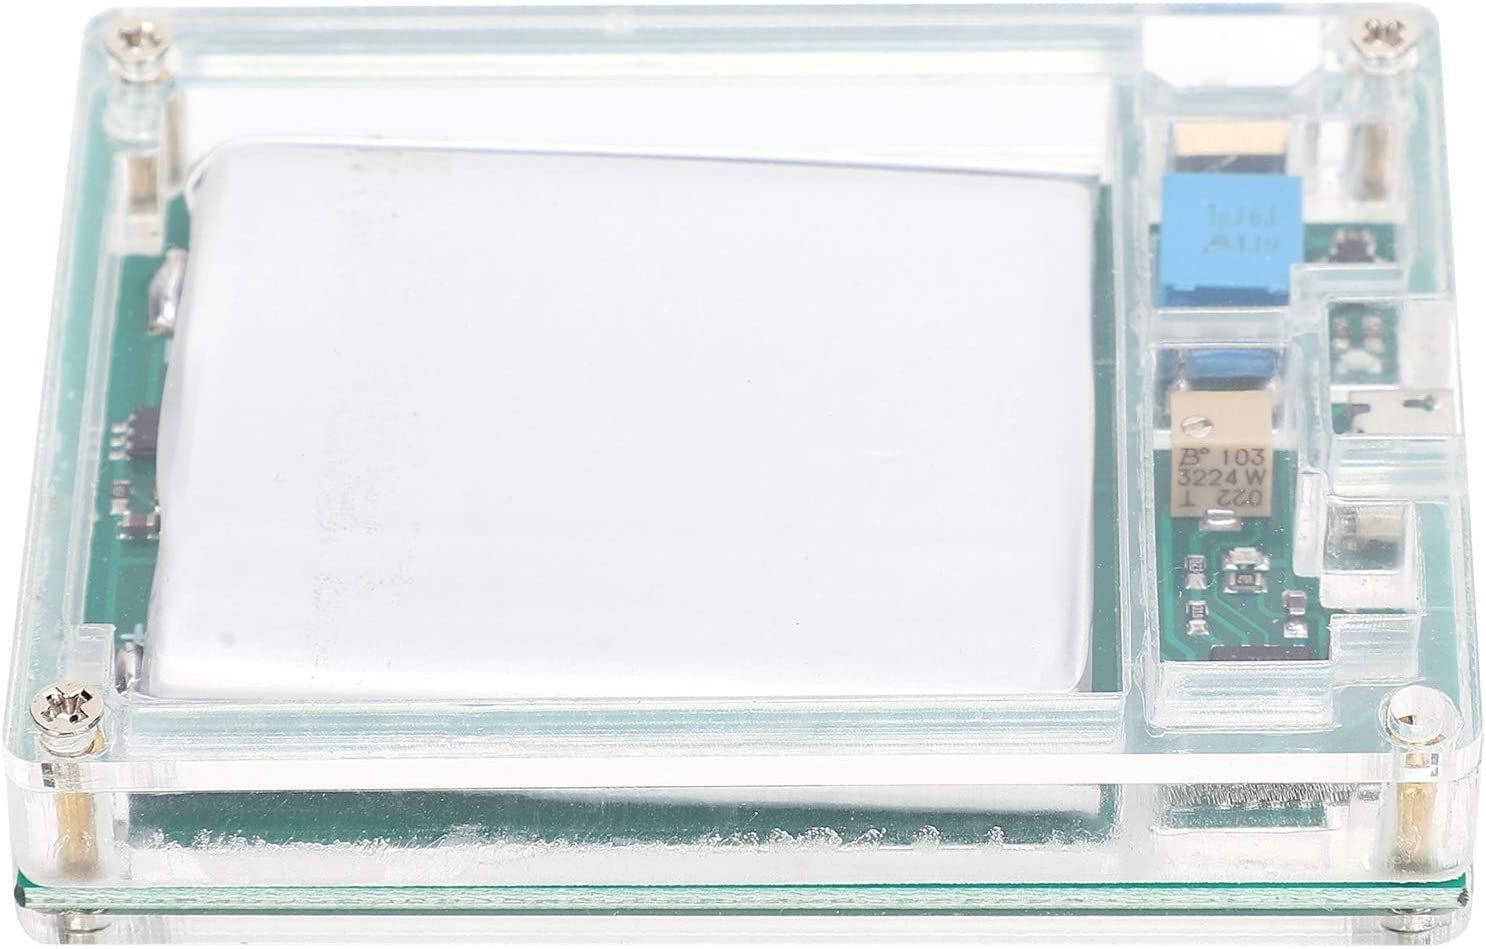 Durable Small Schumann Wave Generator Practical Compact Size for Mcu Motor Driver Schumann Wave Pulse Generator Module